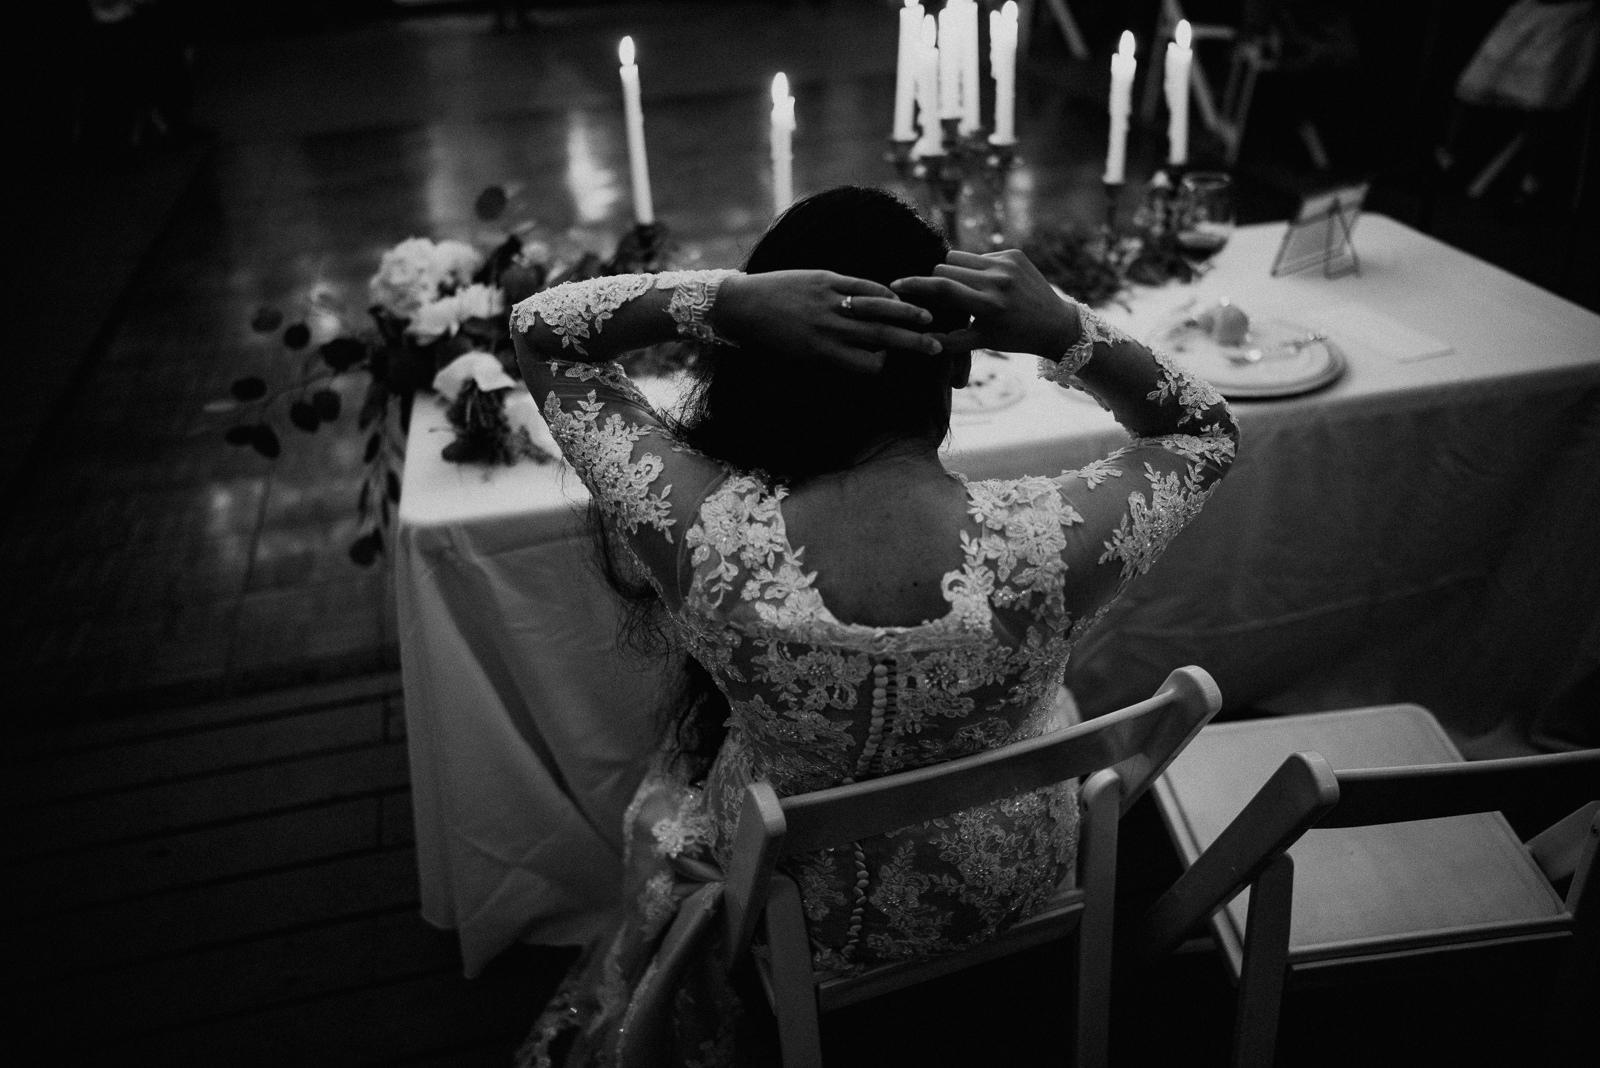 candid wedding photo at reception